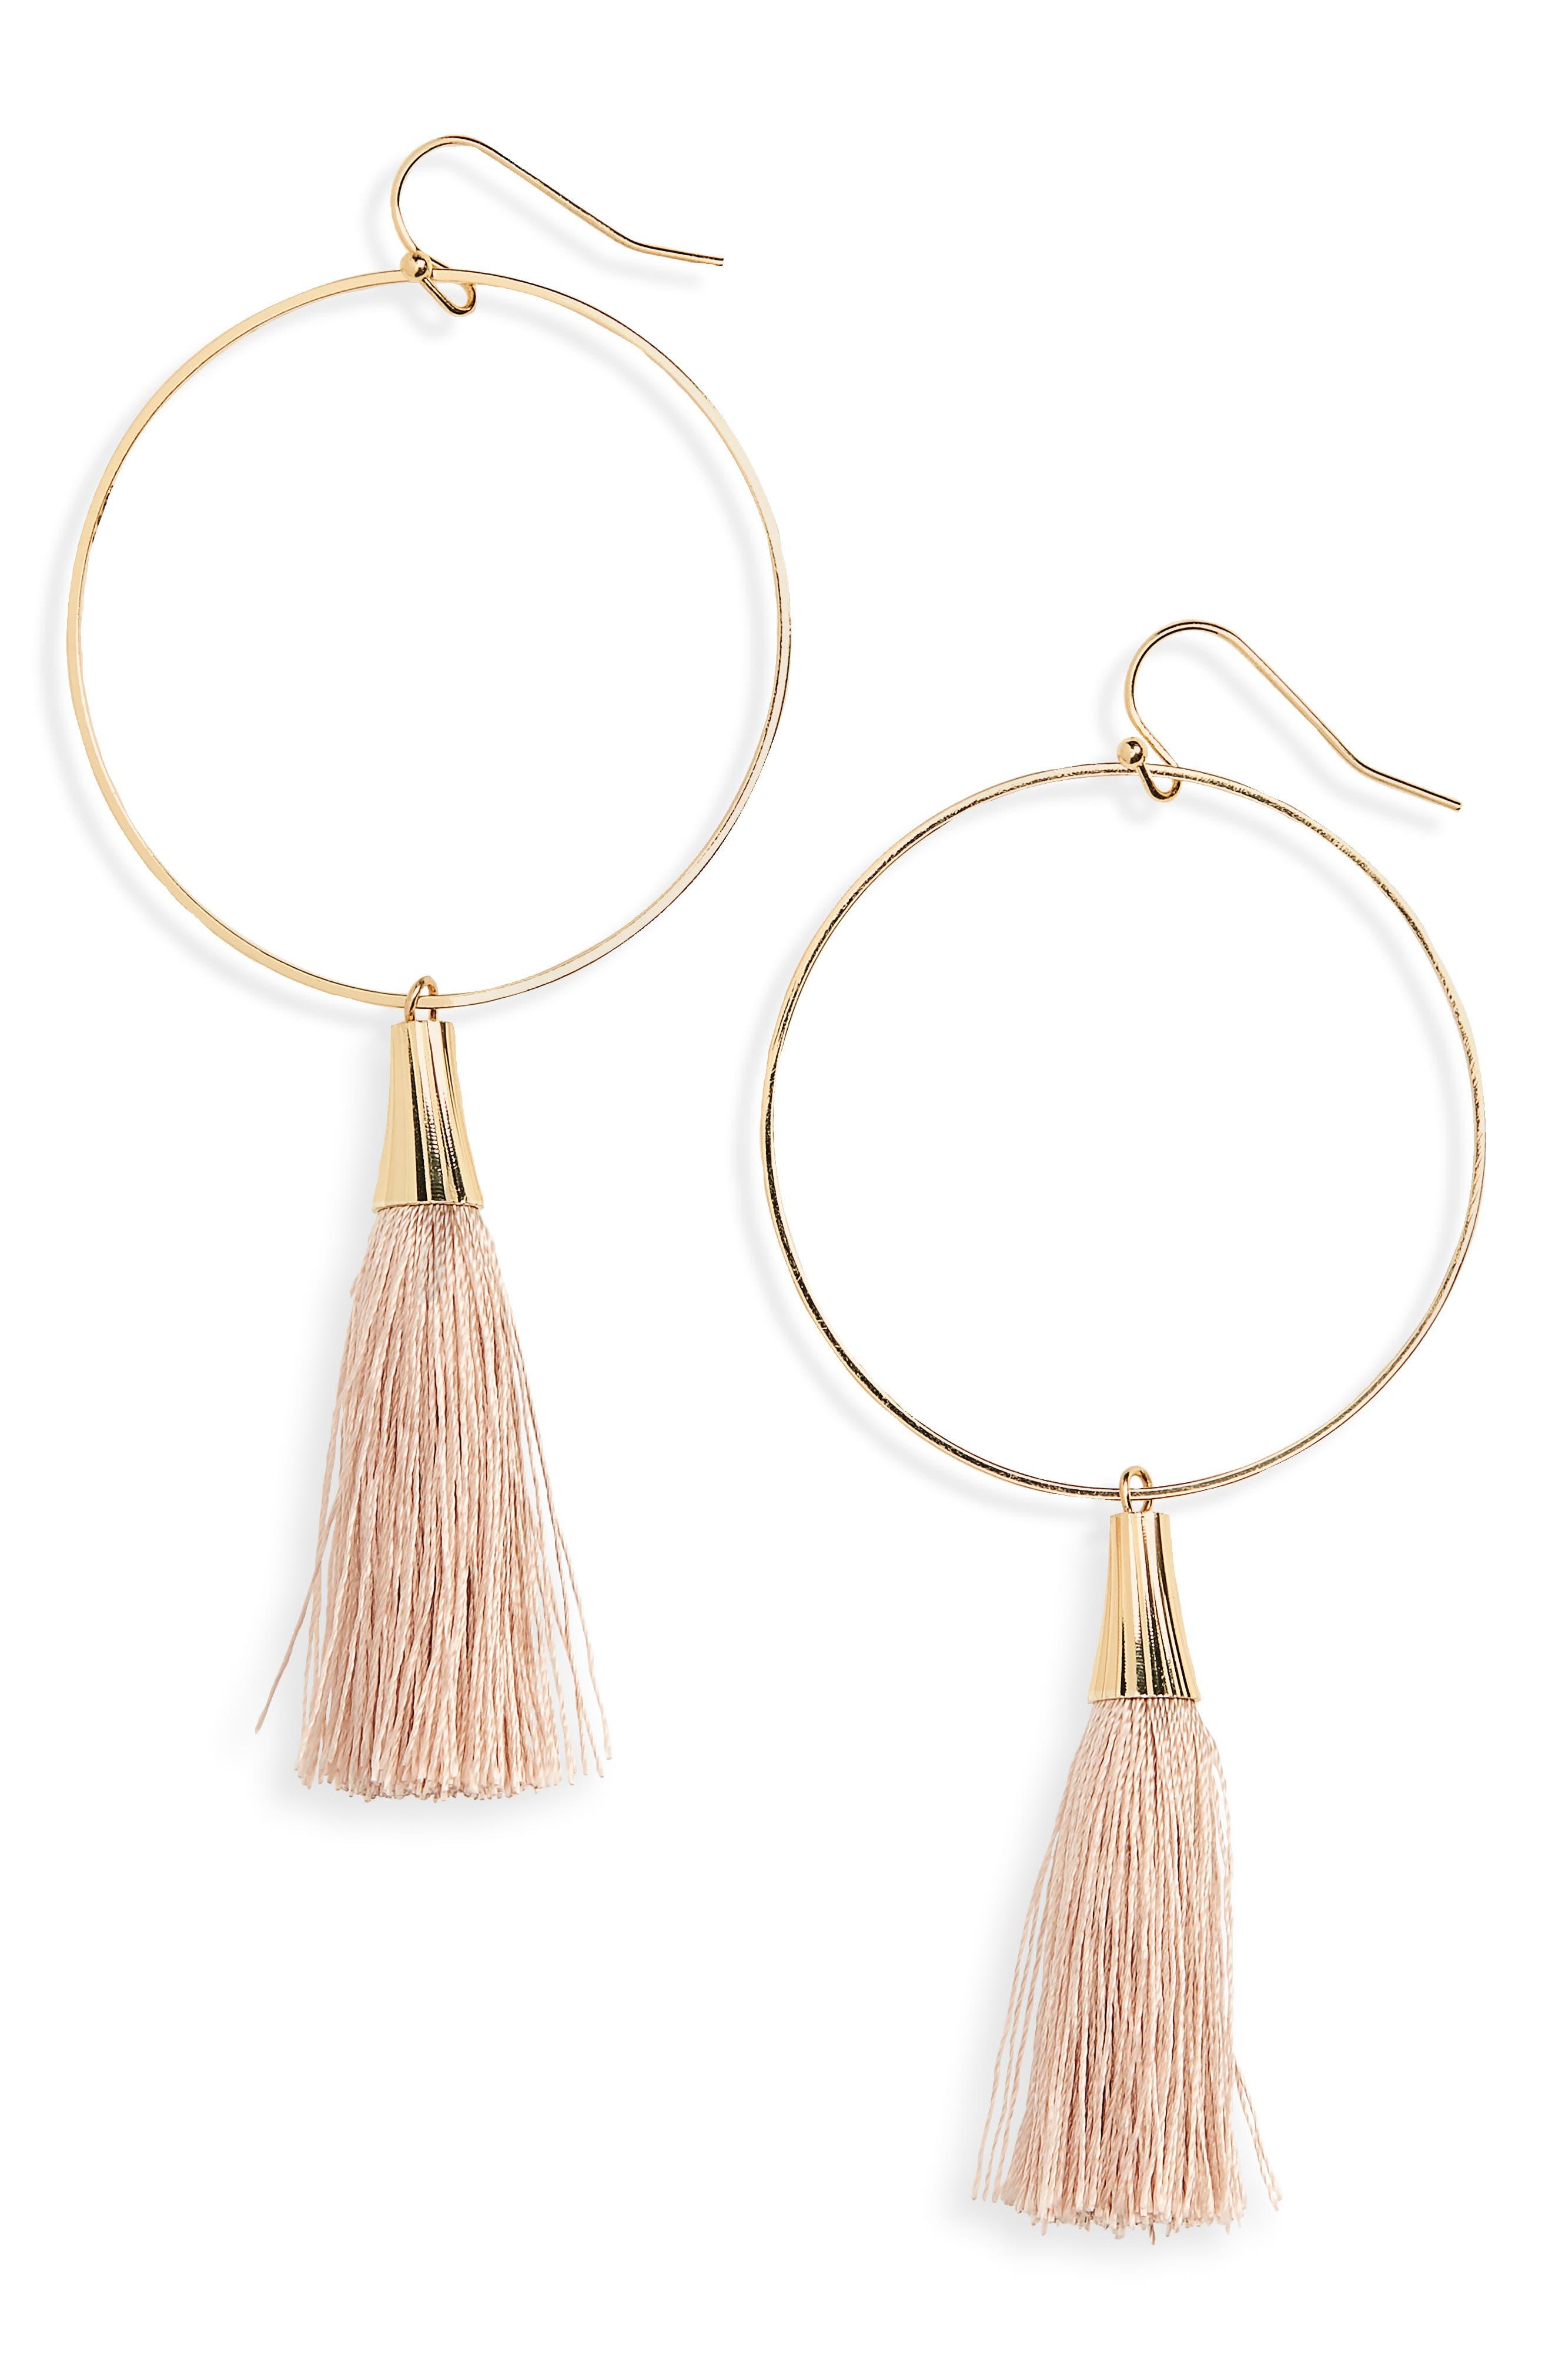 Tassel Hoop Earrings,                             Main thumbnail 1, color,                             250